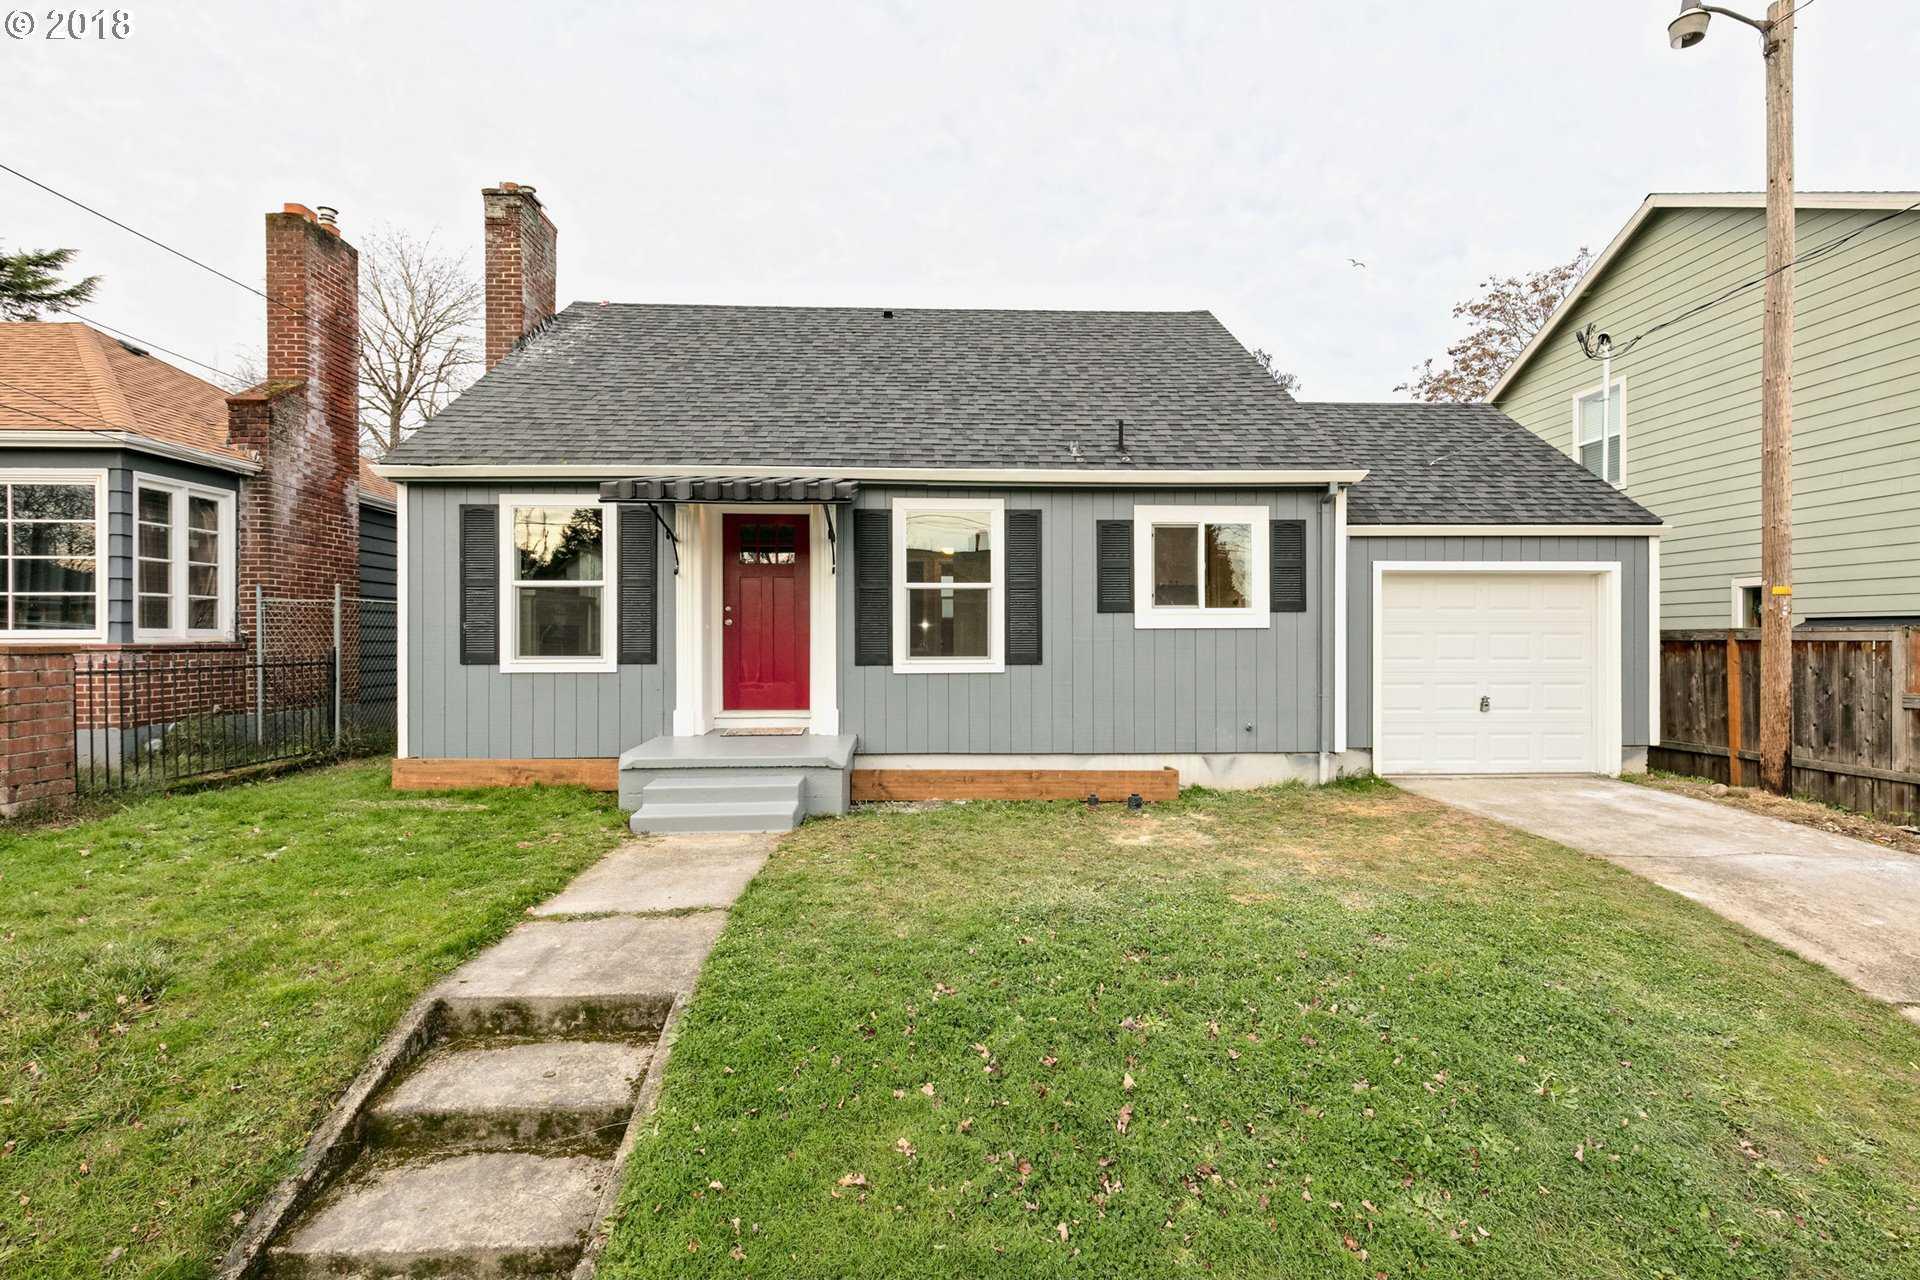 $474,900 - 3Br/2Ba -  for Sale in Woodlawn, Portland